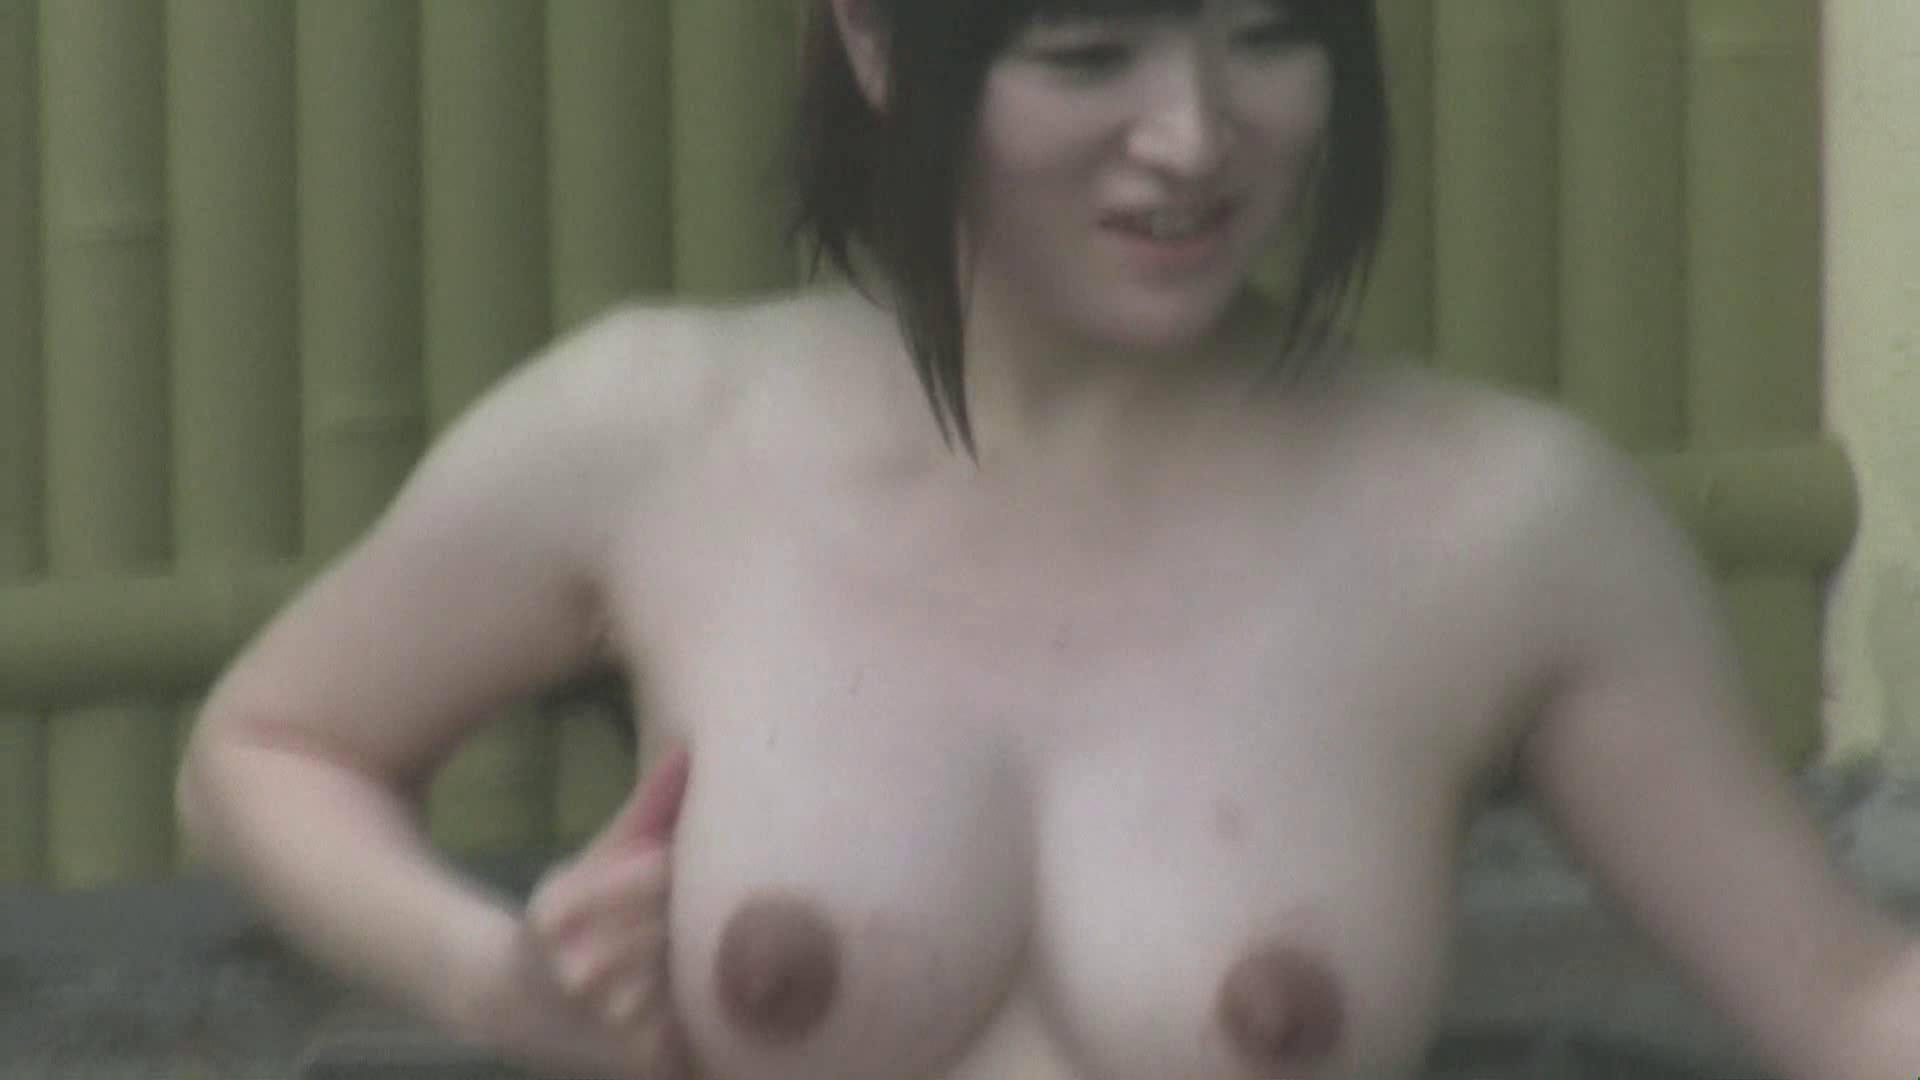 Aquaな露天風呂Vol.606 露天 スケベ動画紹介 110枚 17